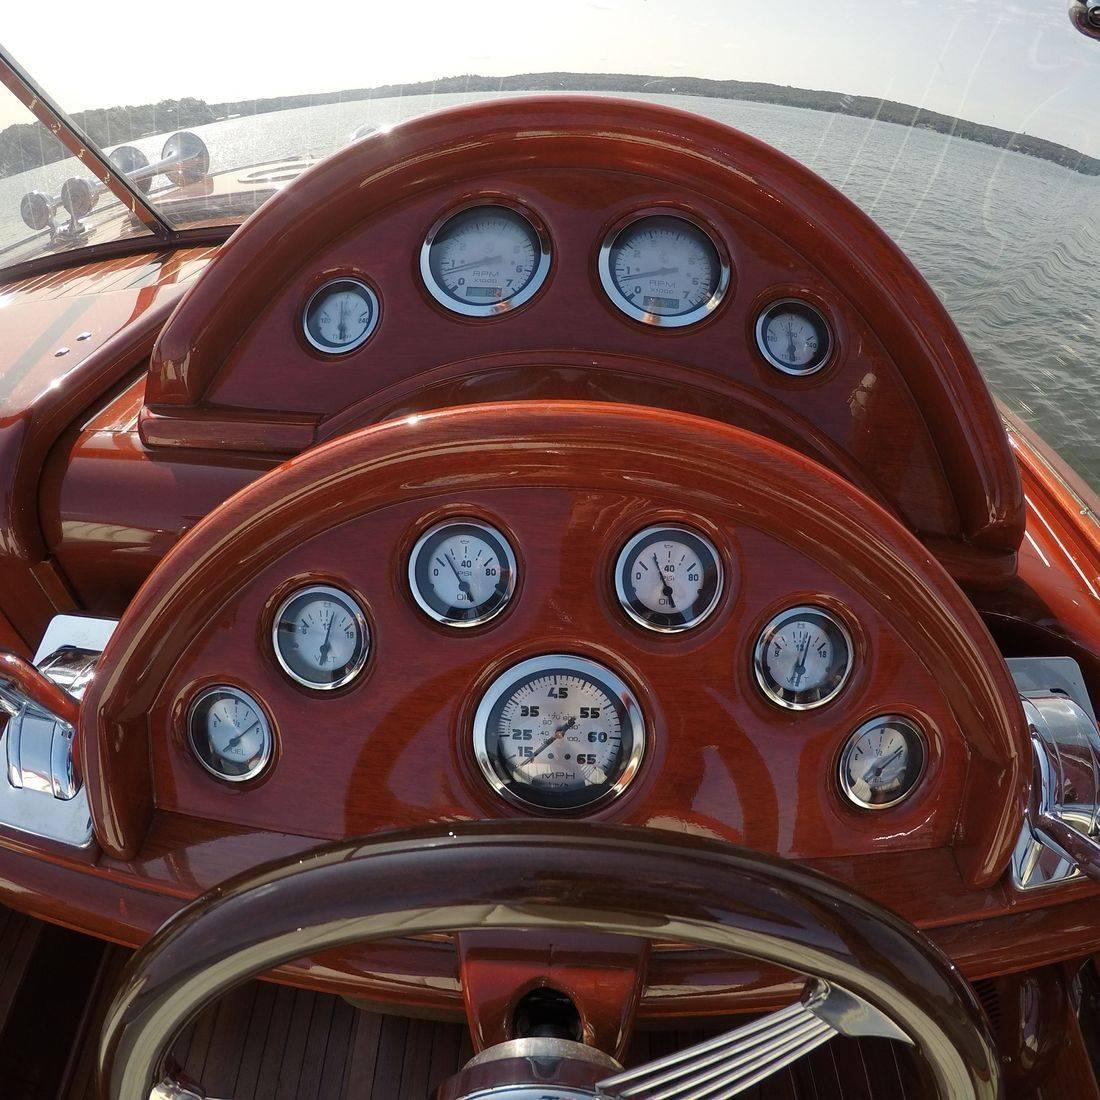 mahogany dash on 27' shepherd boat